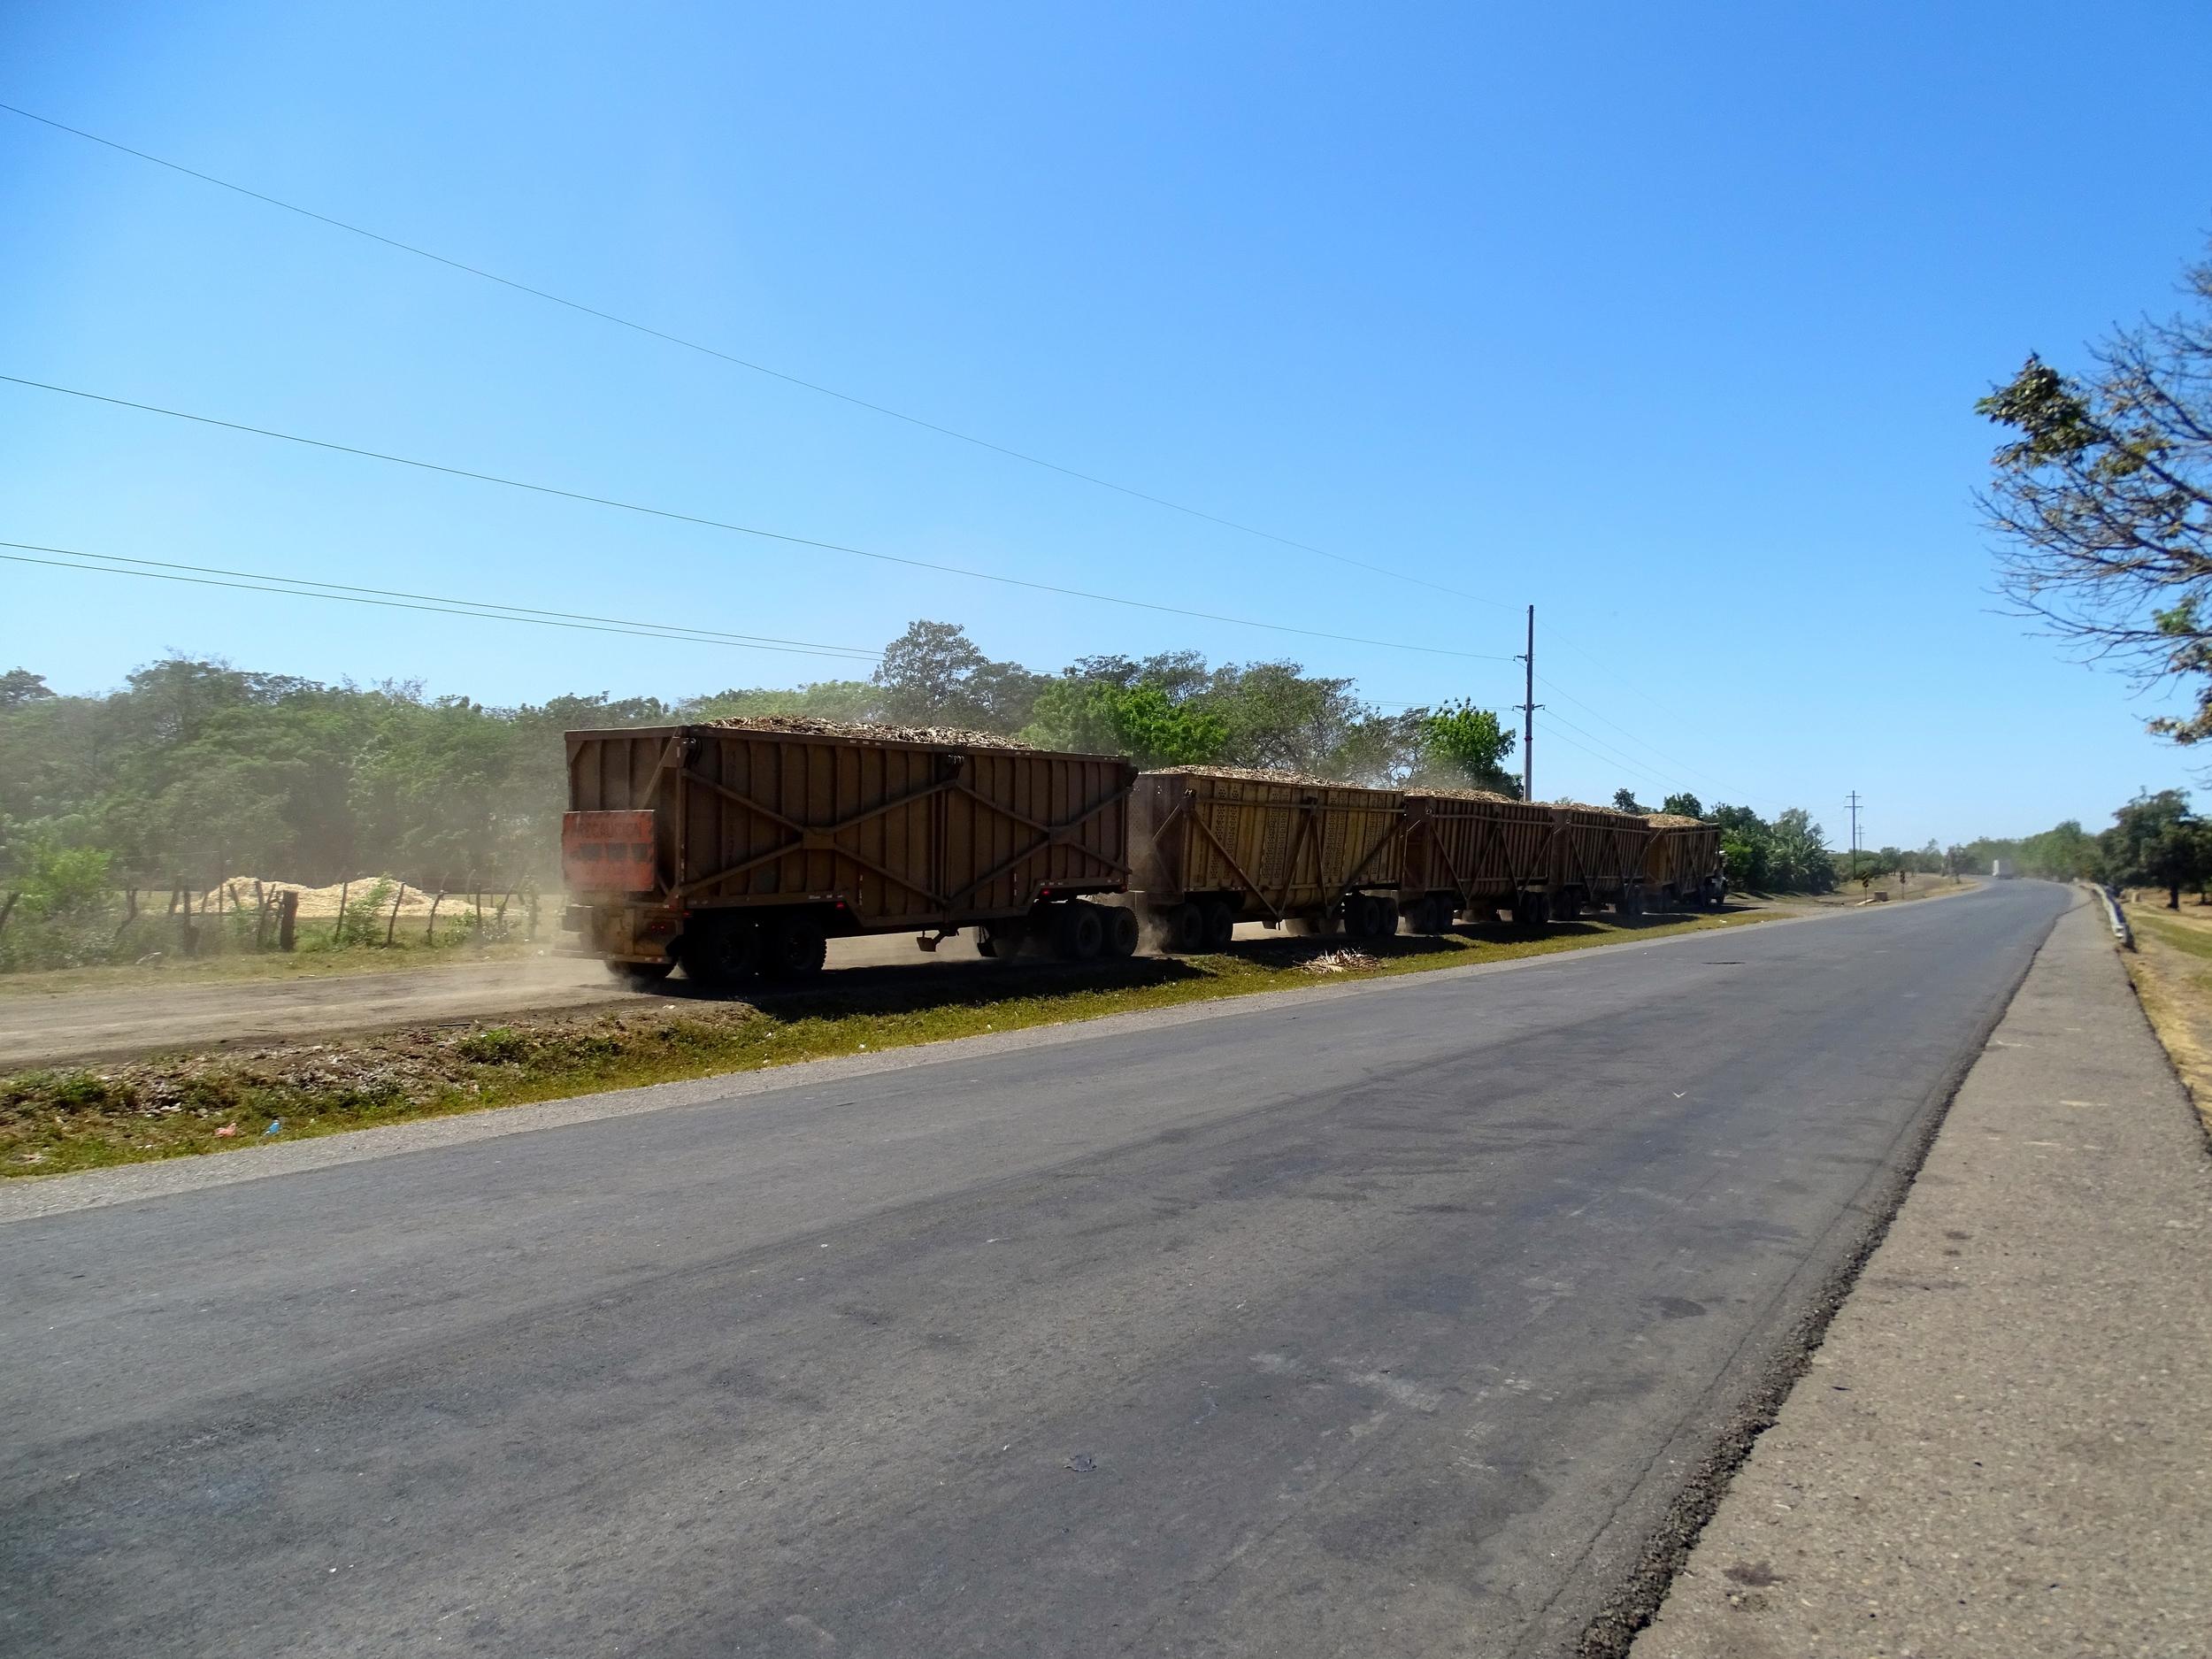 Semi-truck hauling 4 trailers full of sugar cane debris.